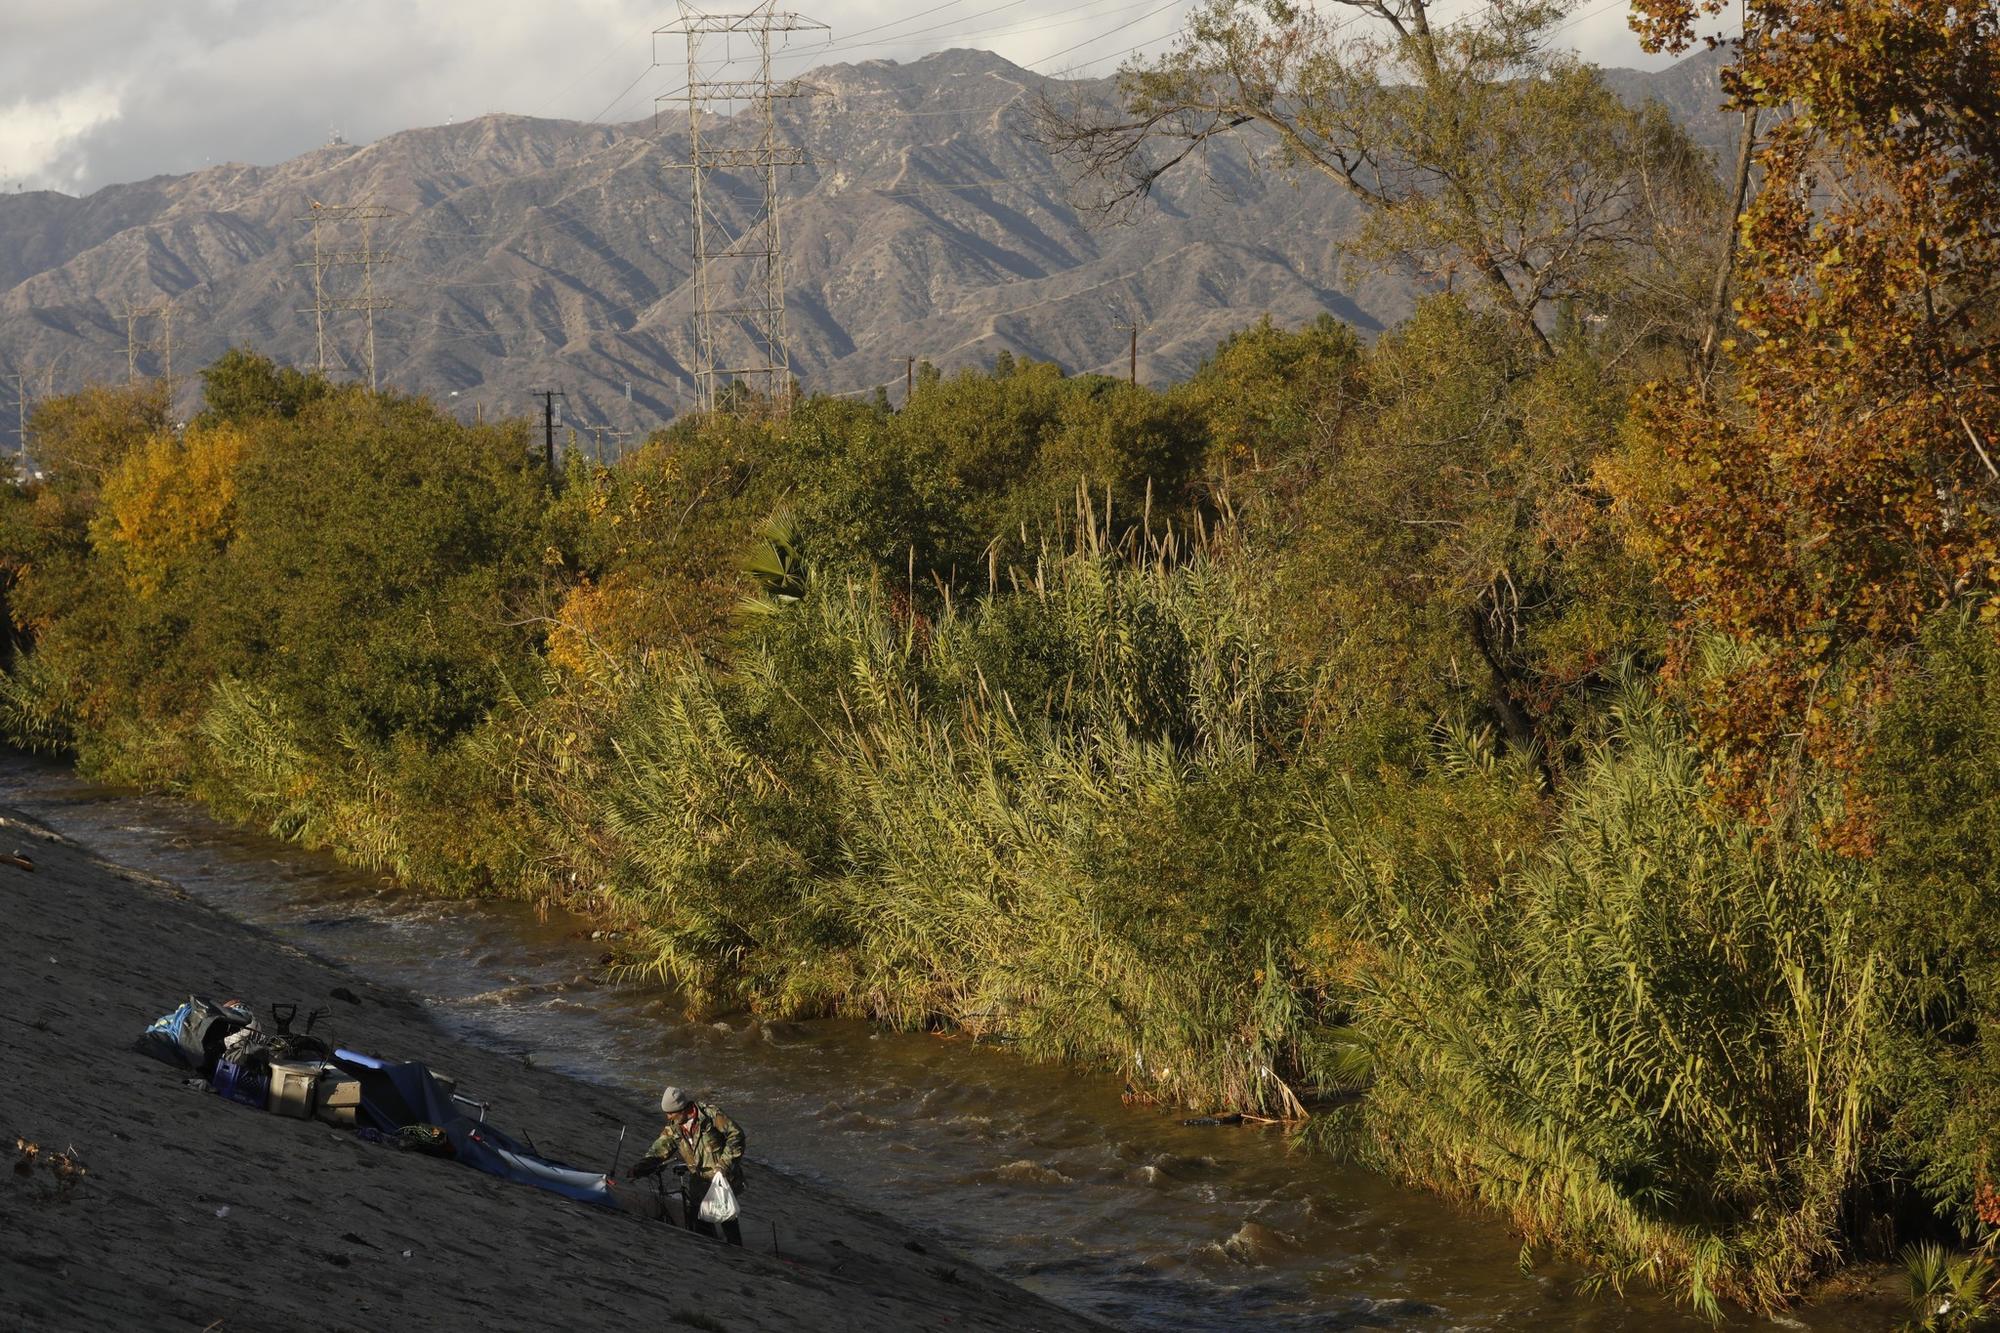 At the L.A. River